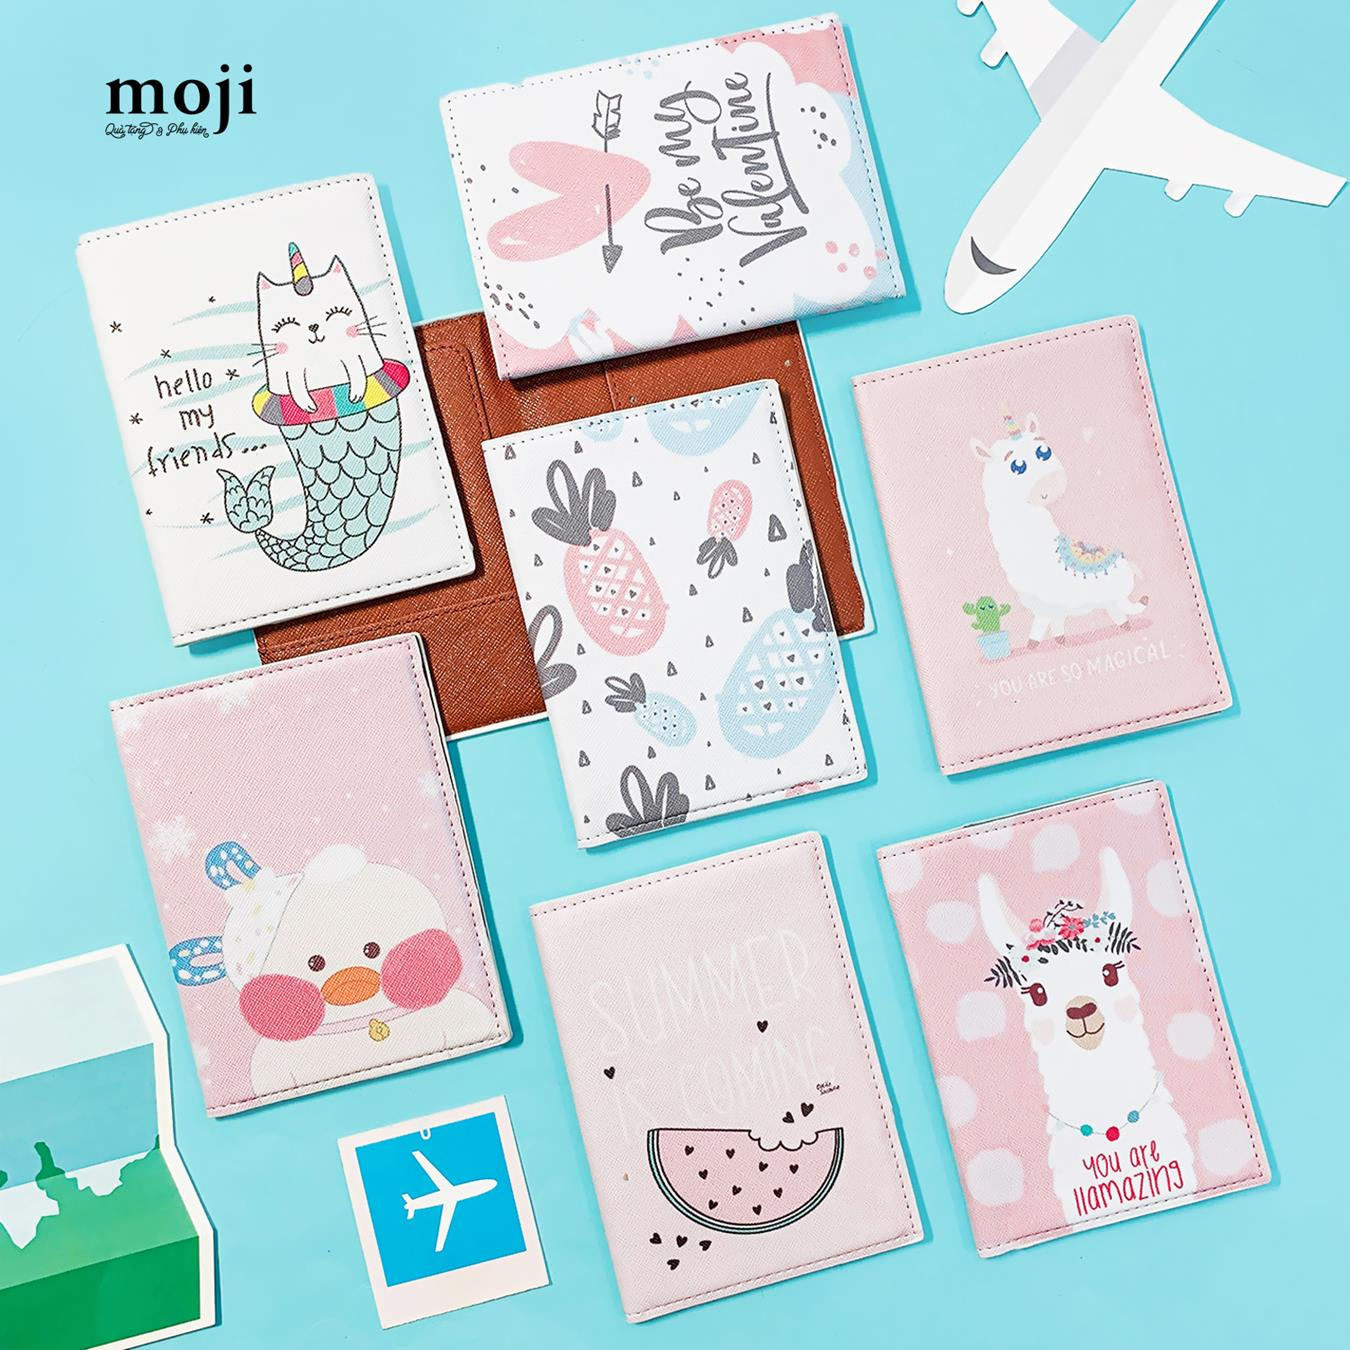 https://storage.googleapis.com/cdn.nhanh.vn/store/7534/psCT/20190504/13670581/Passport_boc_ho_chieu_Mermaid_and_Cat_Hello_My_Friends_10x14_(img_3594).jpg